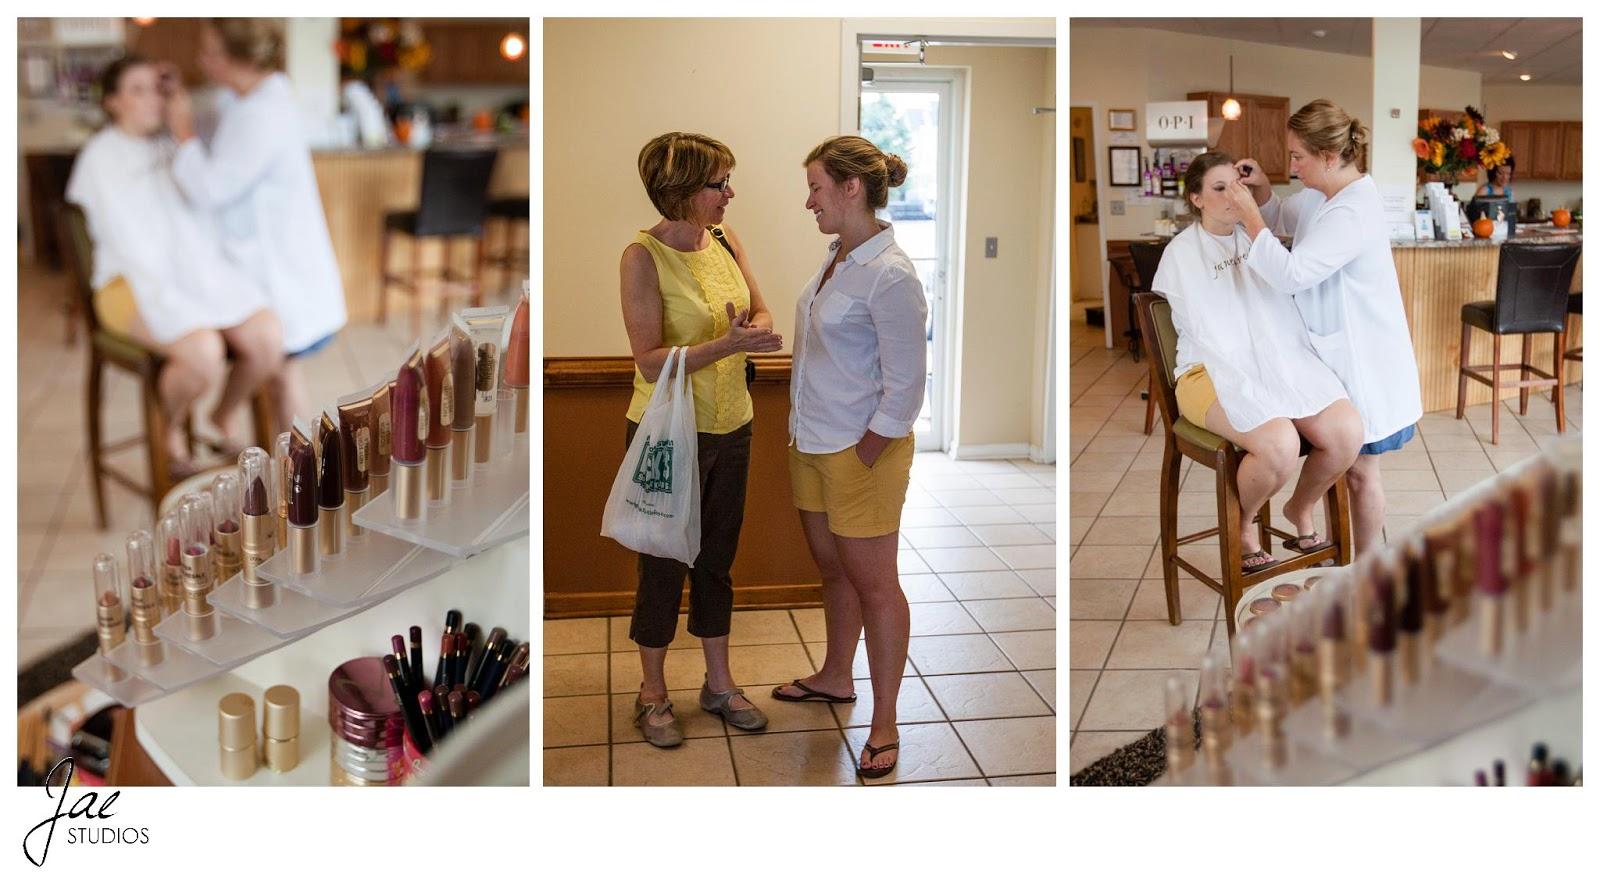 Jonathan and Julie, Bird cage, West Manor Estate, Wedding, Lynchburg, Virginia, Jae Studios, bride, mother, getting ready, makeup, bag, yellow, blue, black